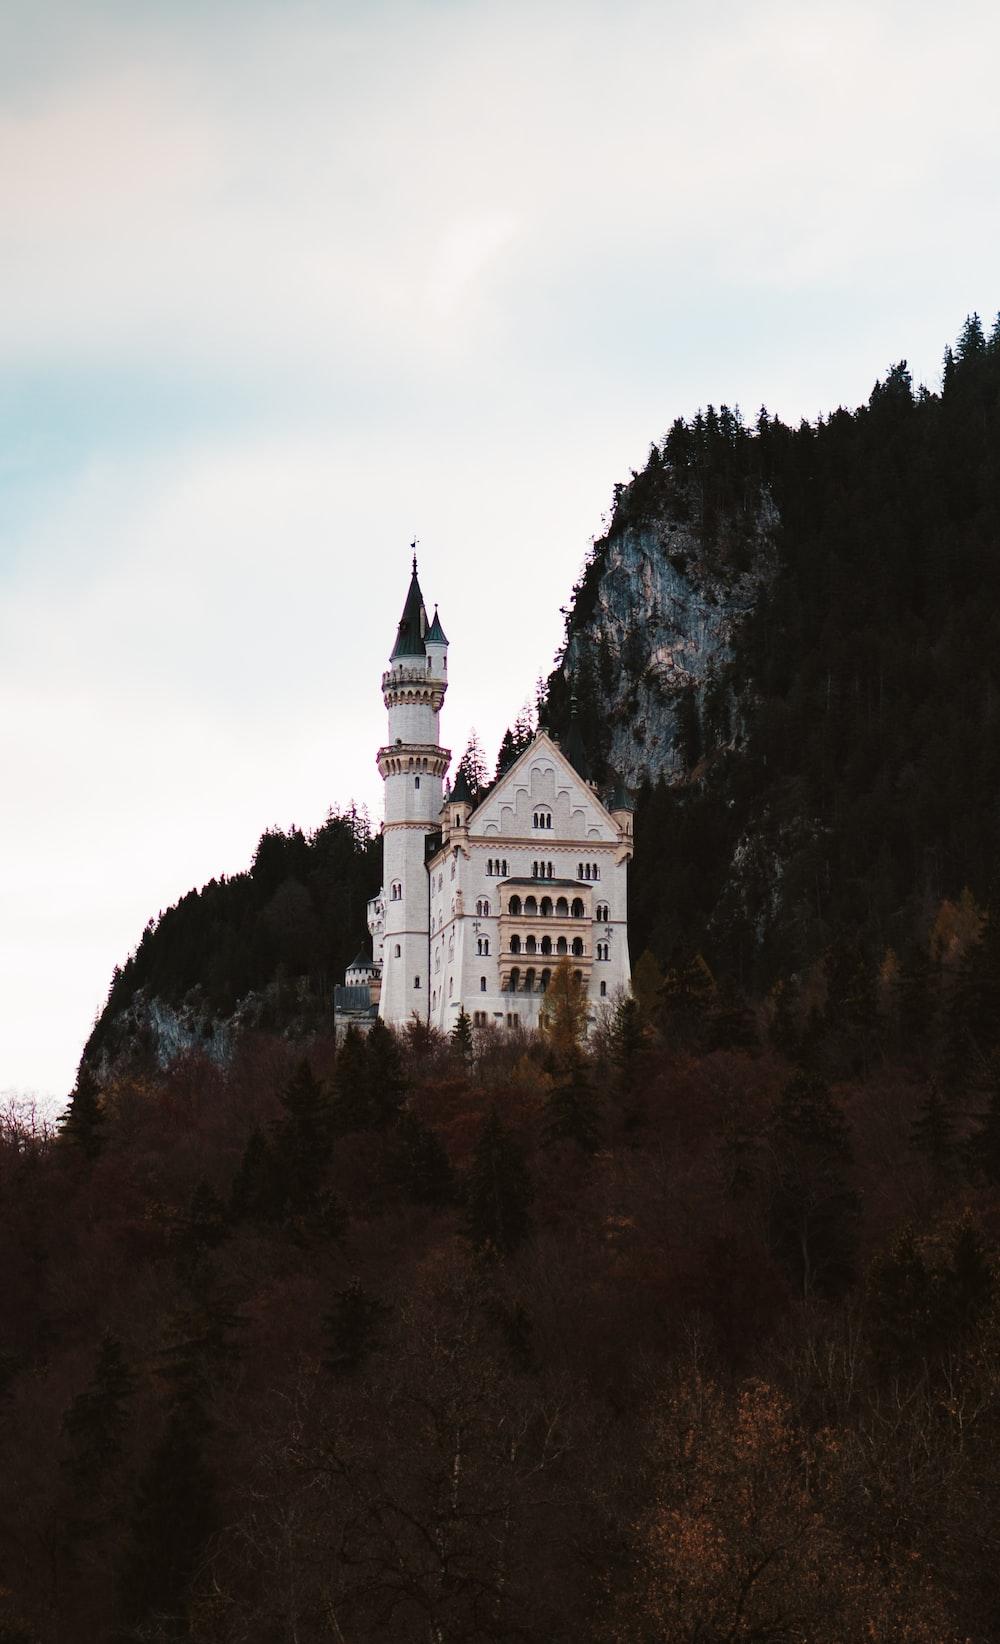 white castle beside trees at daytime